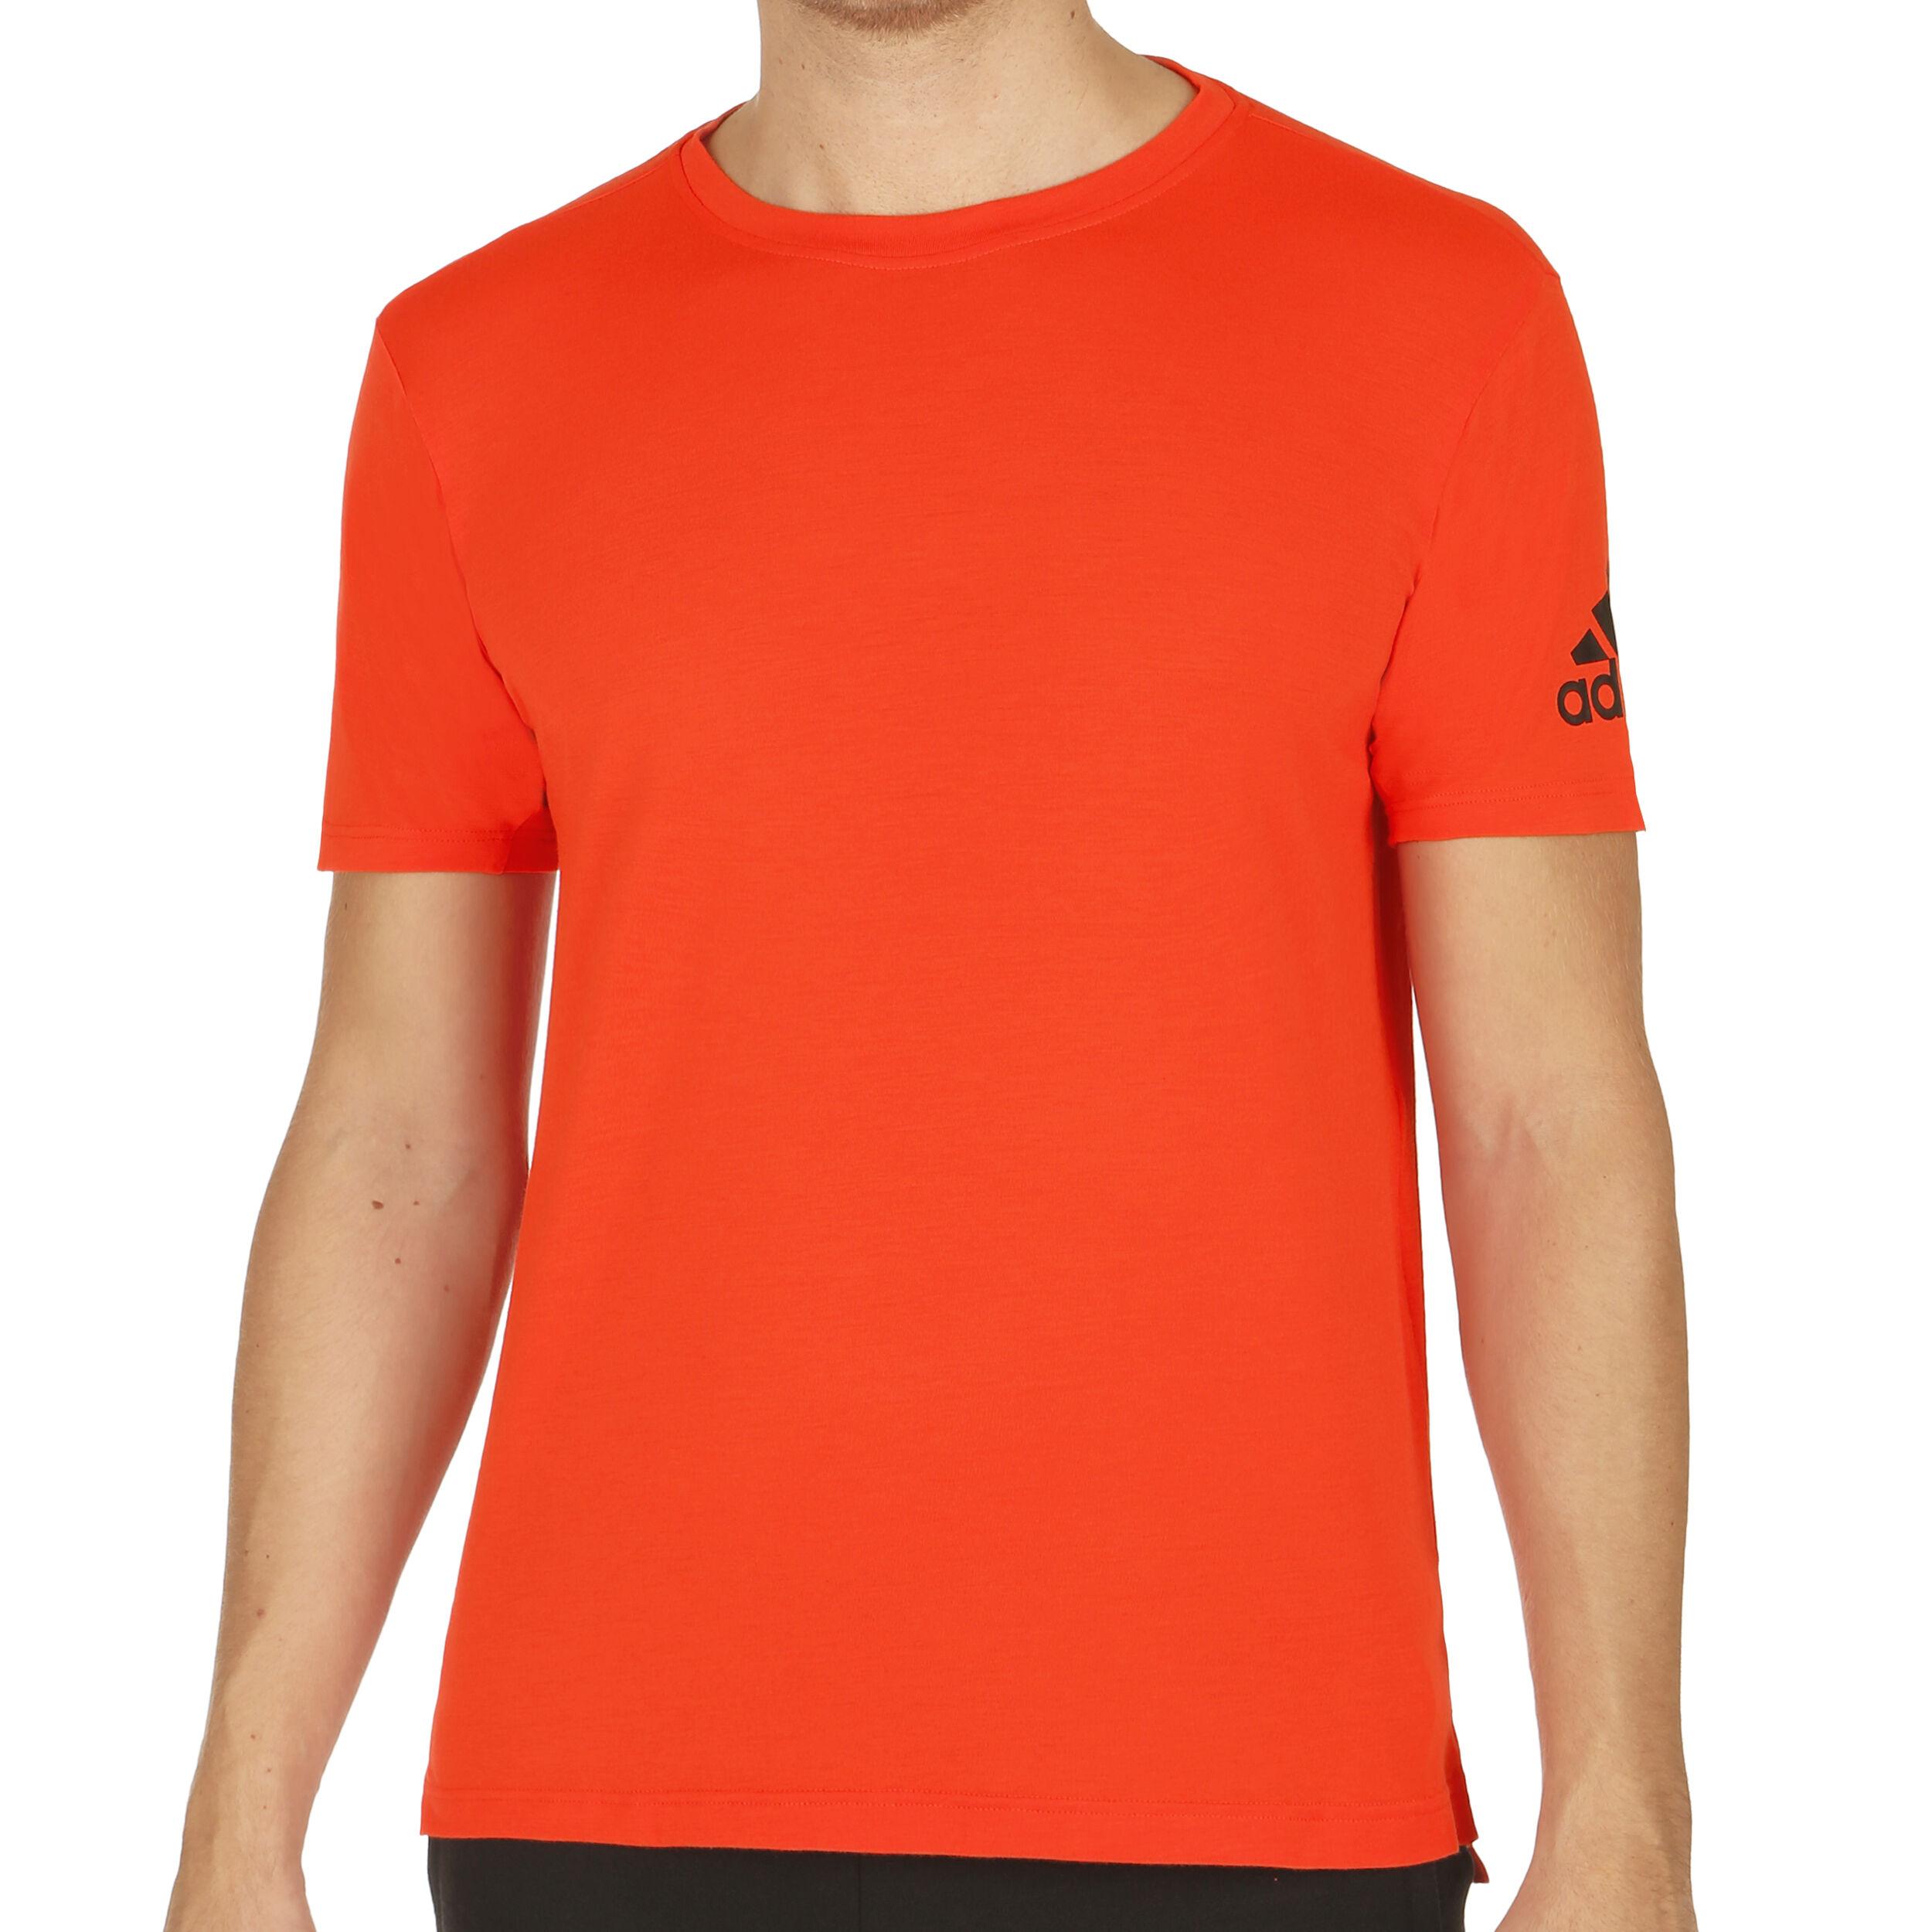 ADIDAS Herren Fitness Shirt FreeLift Prime orange | L